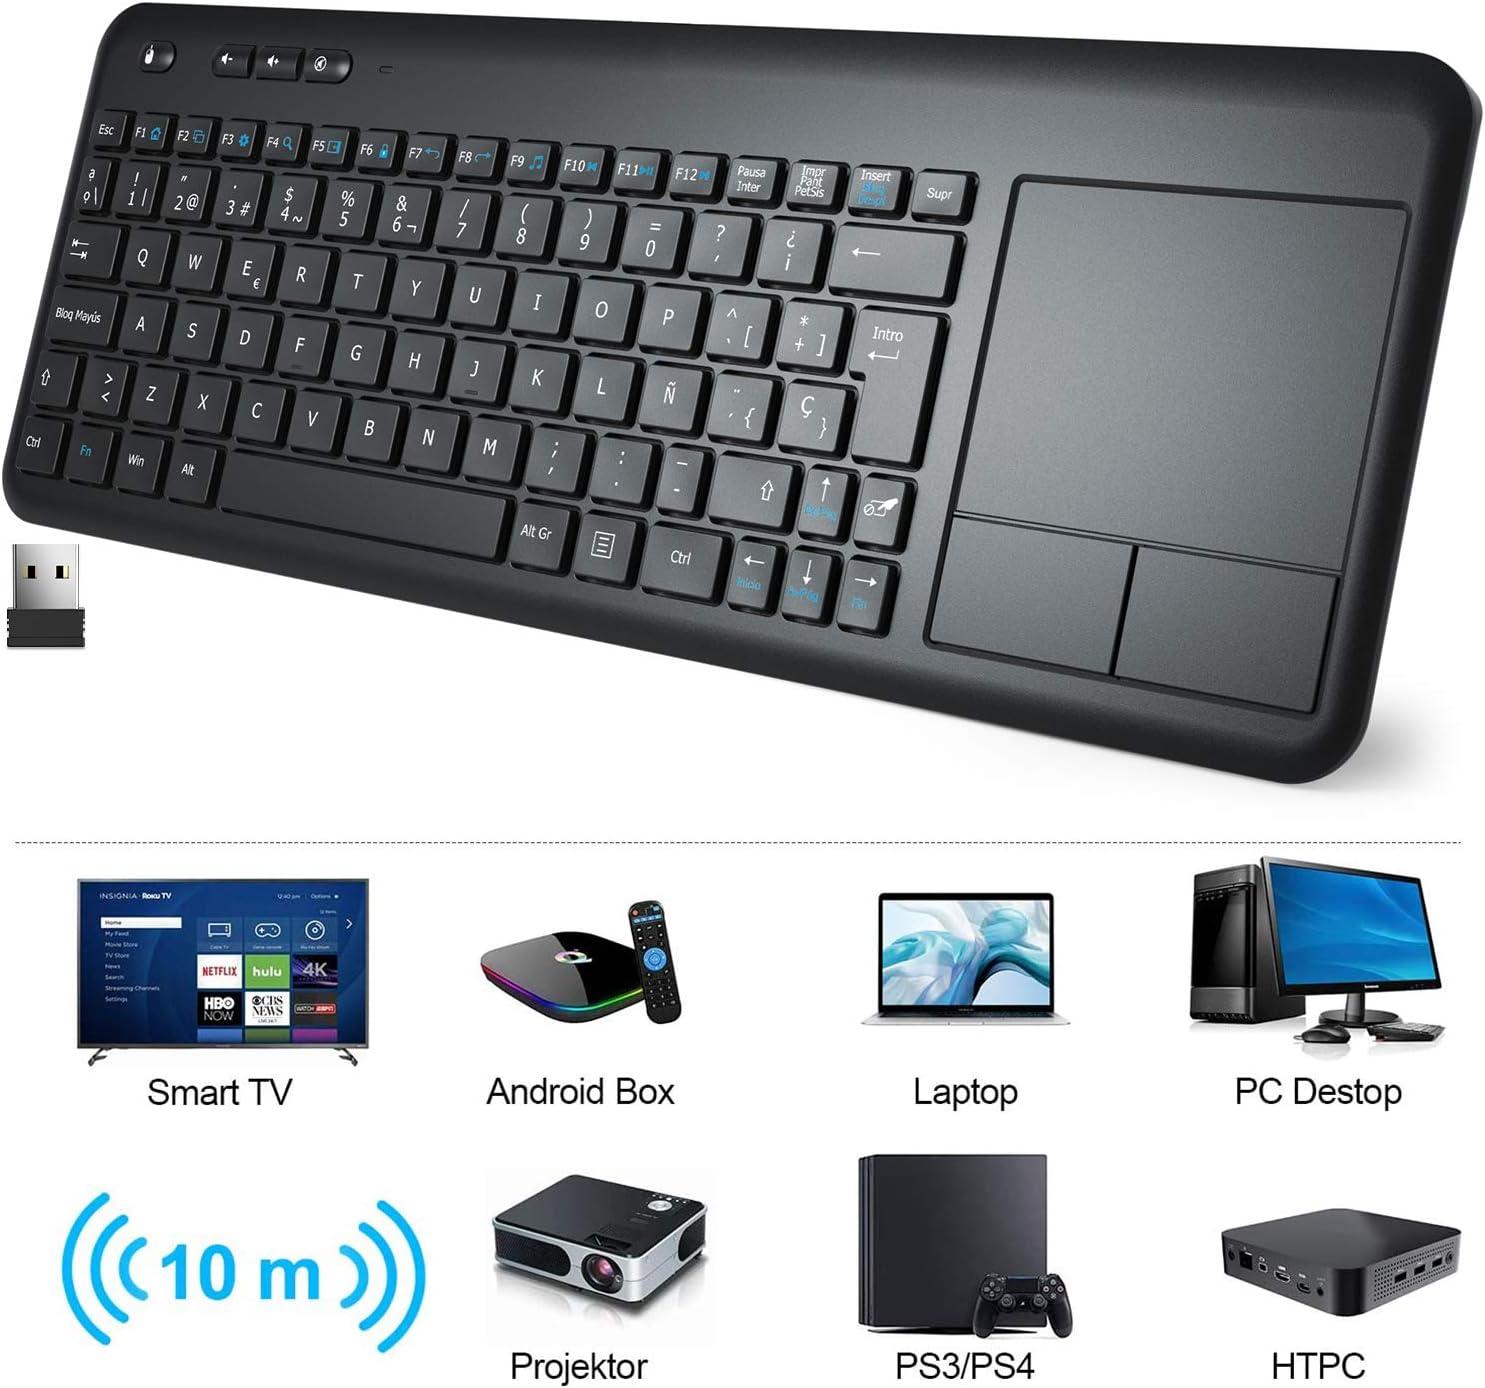 Teclado Táctil Inalámbrico, WisFox Teclado Inalámbrico Ultra Delgado de 2.4G con Trackpad Multitoque de Gran TamañoIncorporado para Smart TV HTPC Tableta PC Computadora Portátil Google Windows Android